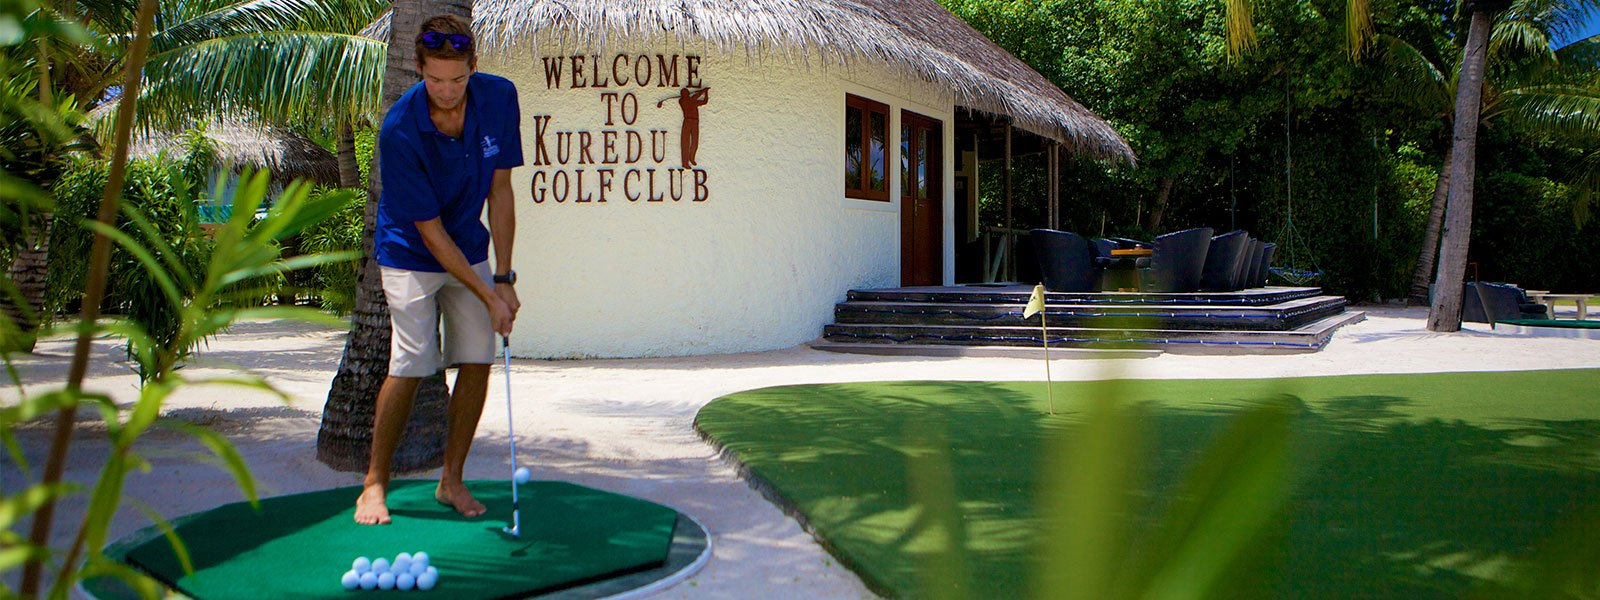 kuredu-sports-golf_1600x600